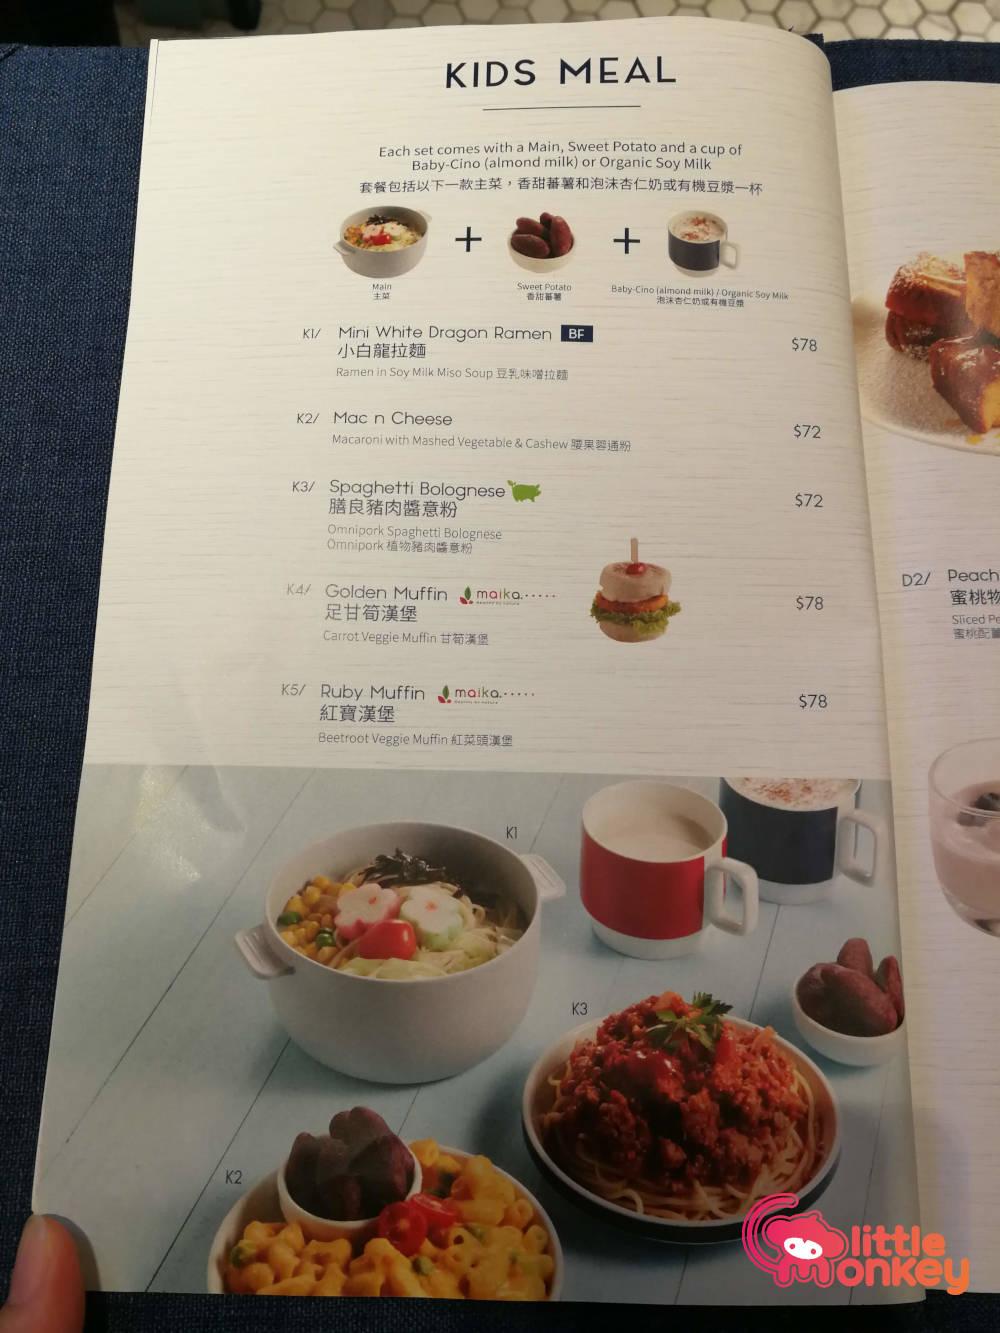 Kind Kitchen's kids menu meal